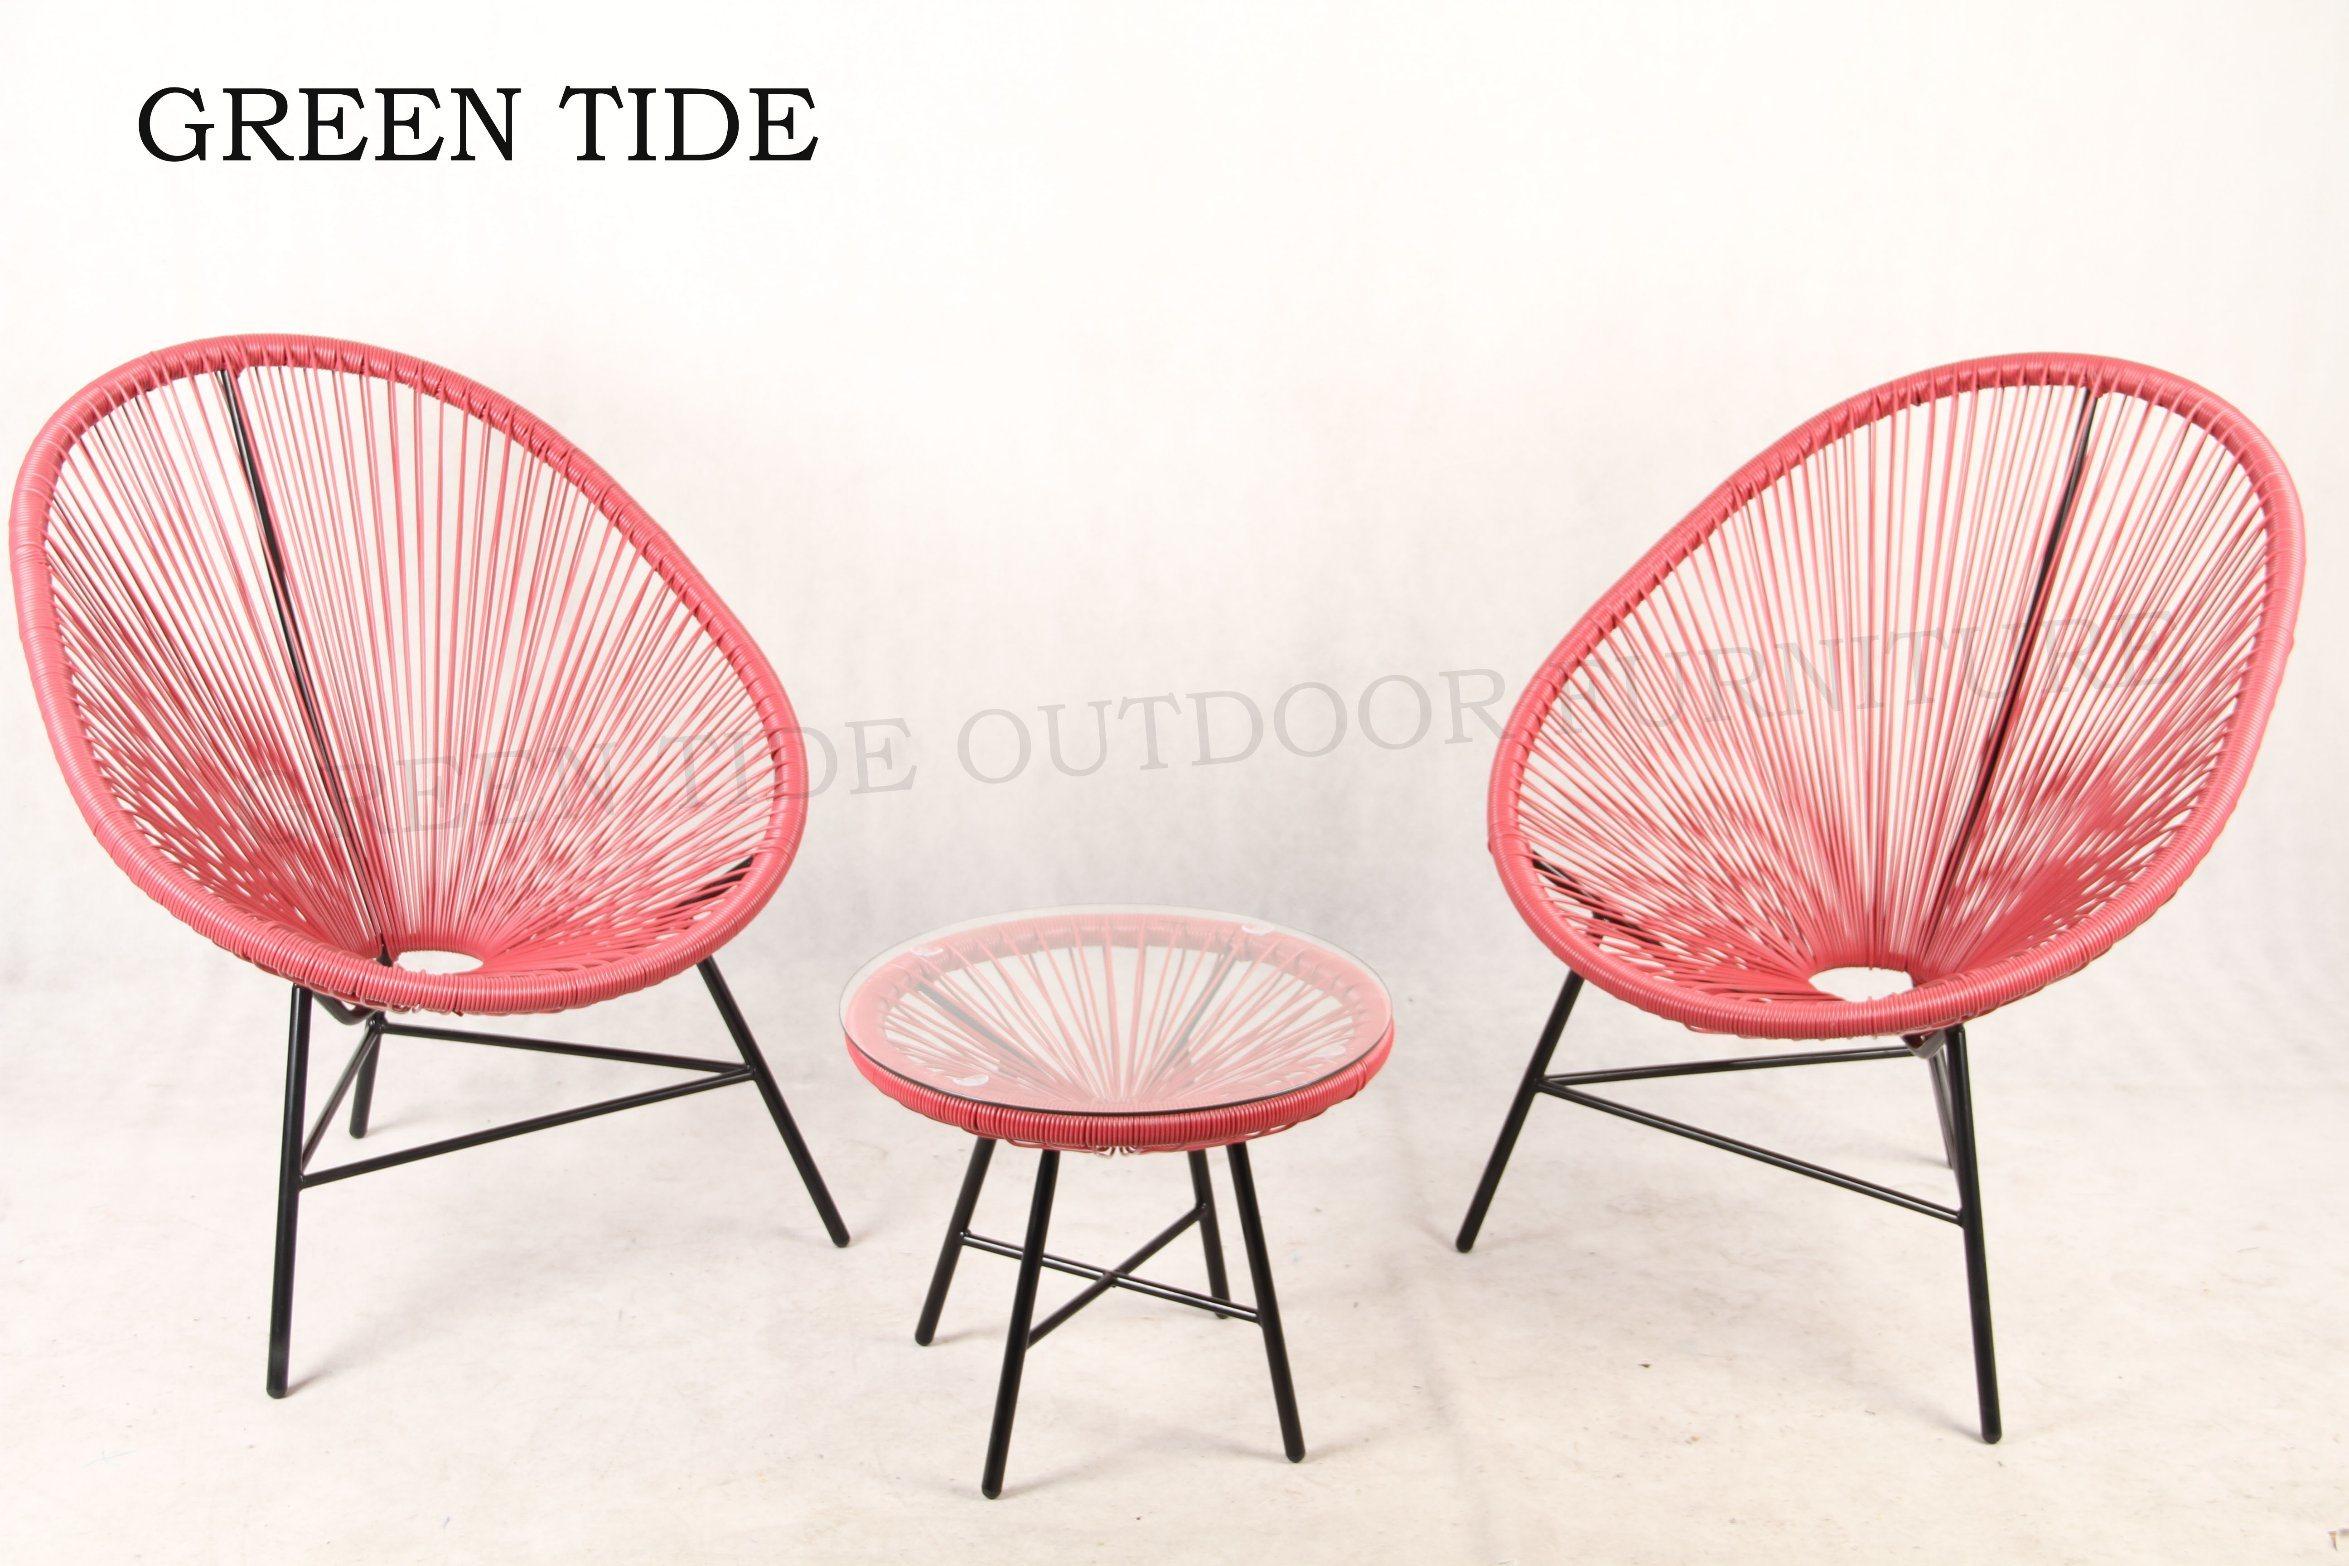 De Egg Chair.China Outdoor Garden Furniture Steel Rattan Wicker Rocking Egg